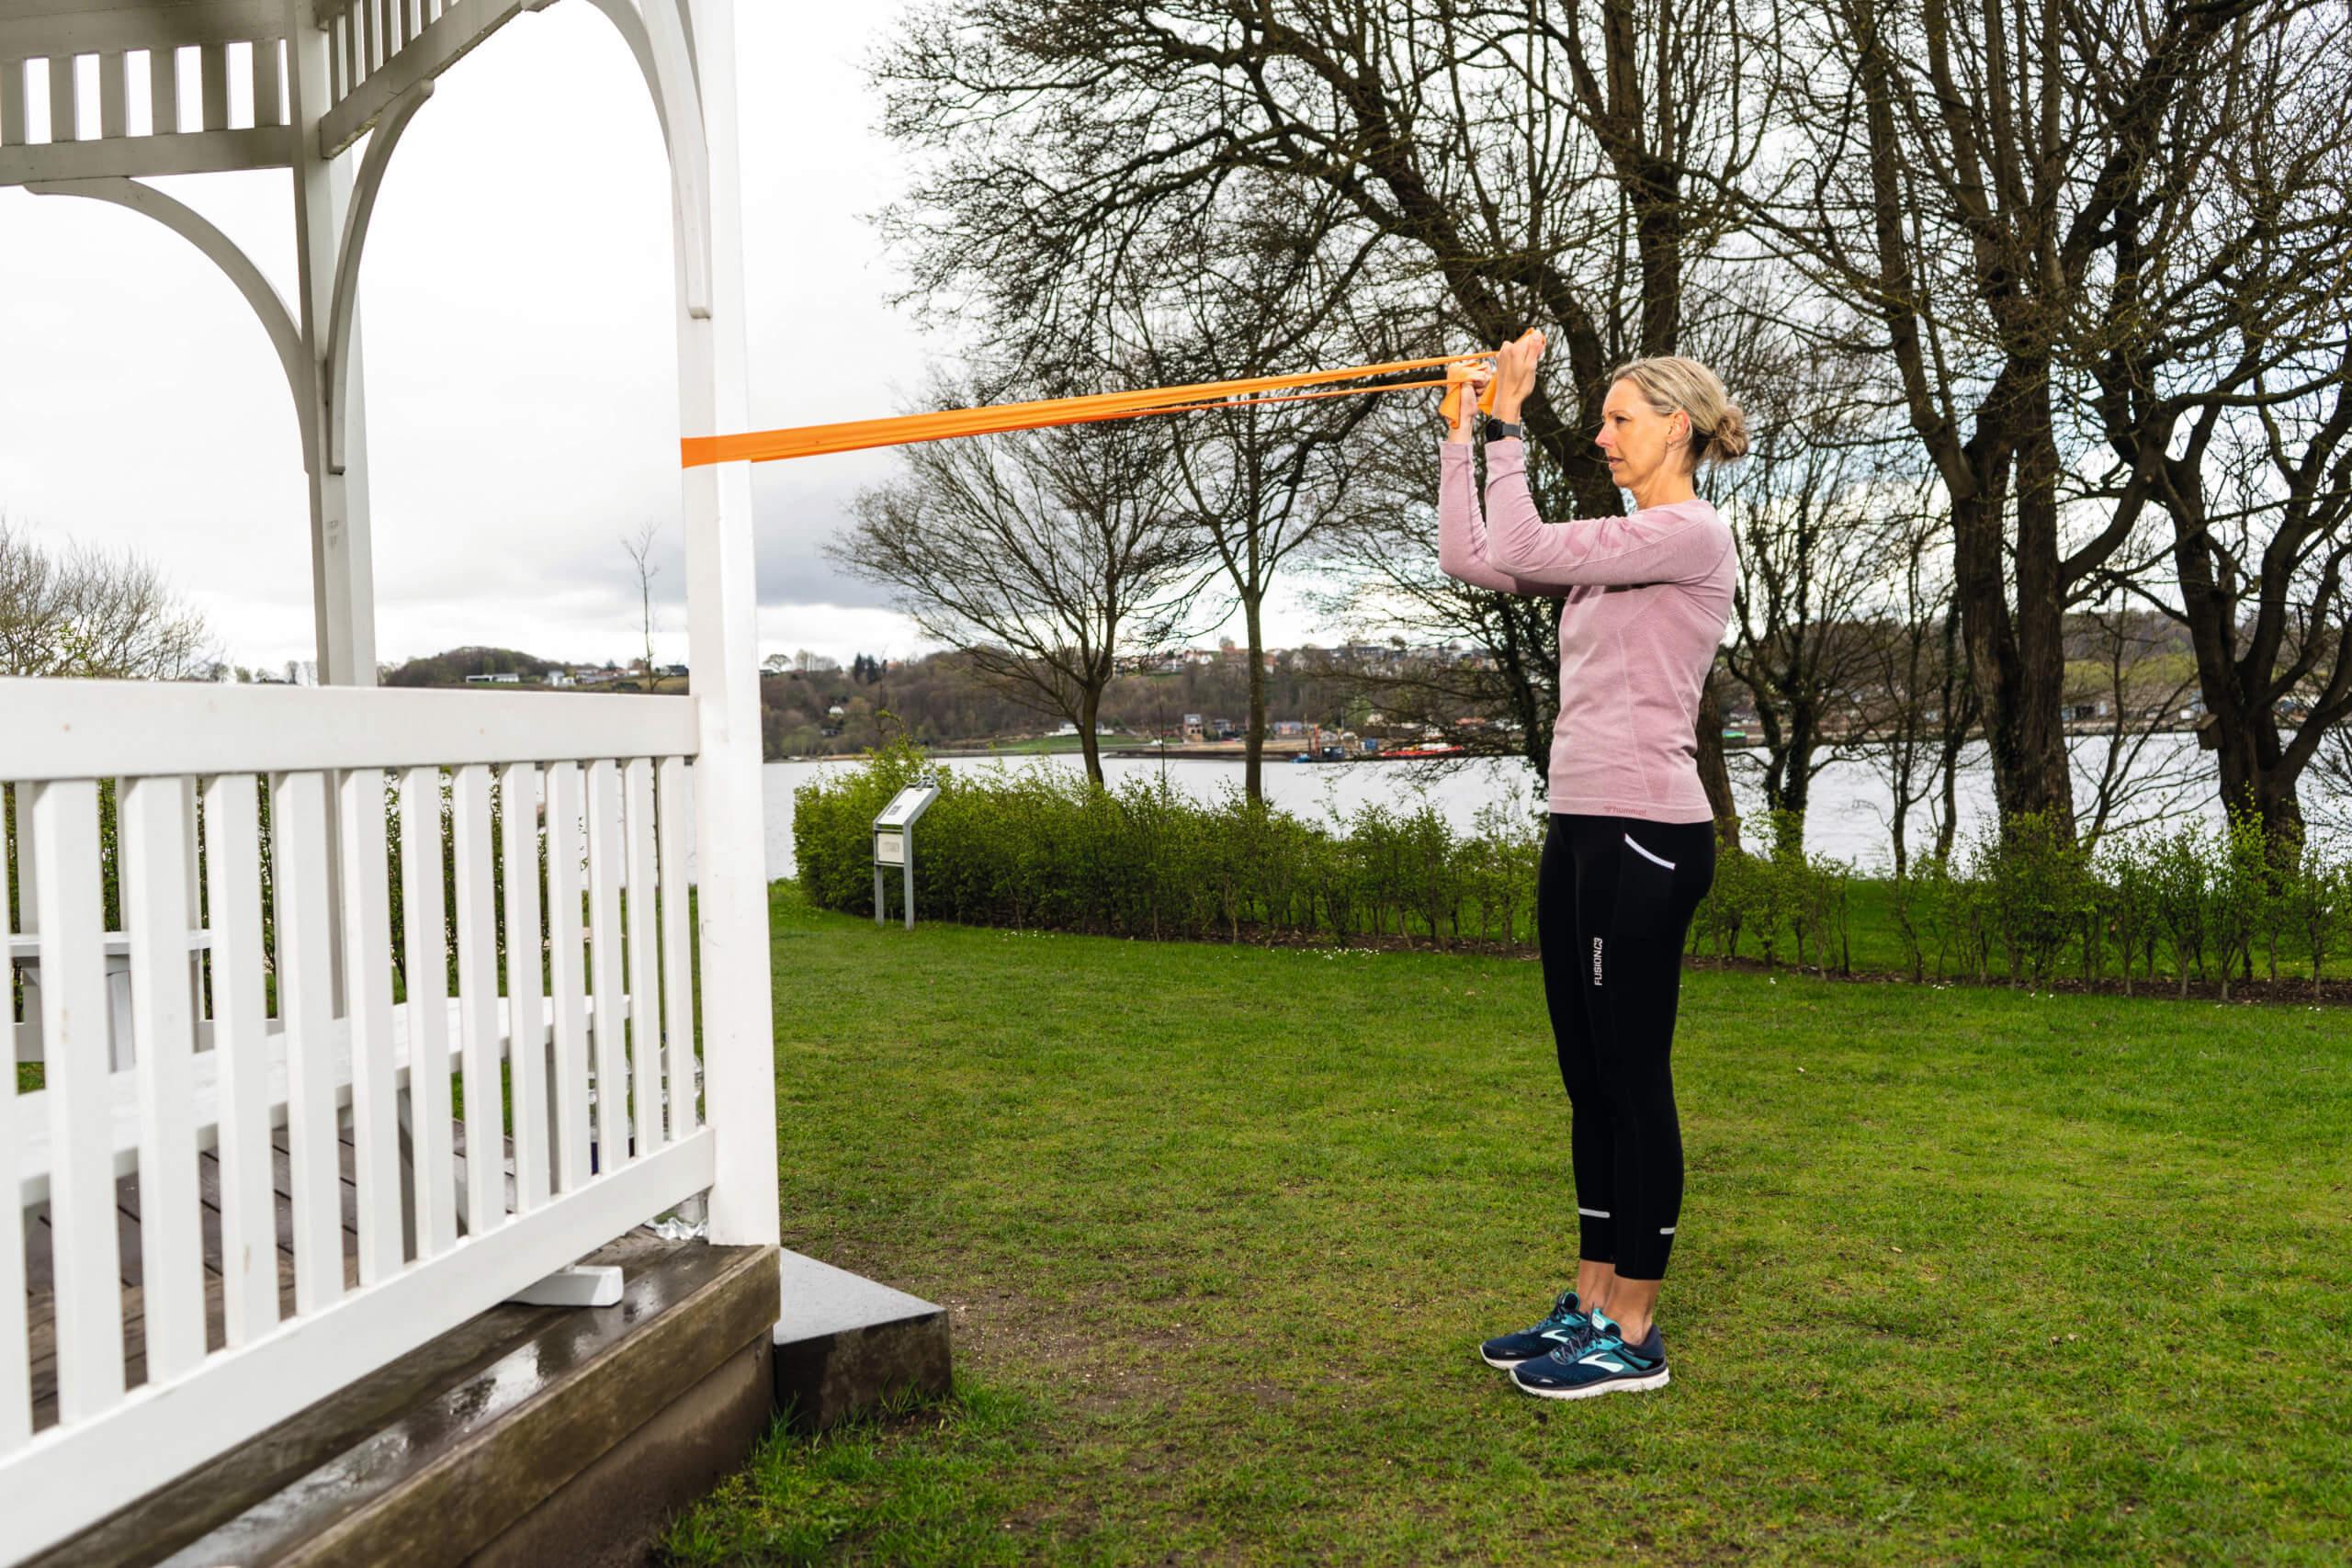 Styrk og stram op: 6 effektive øvelser for arme og overkrop